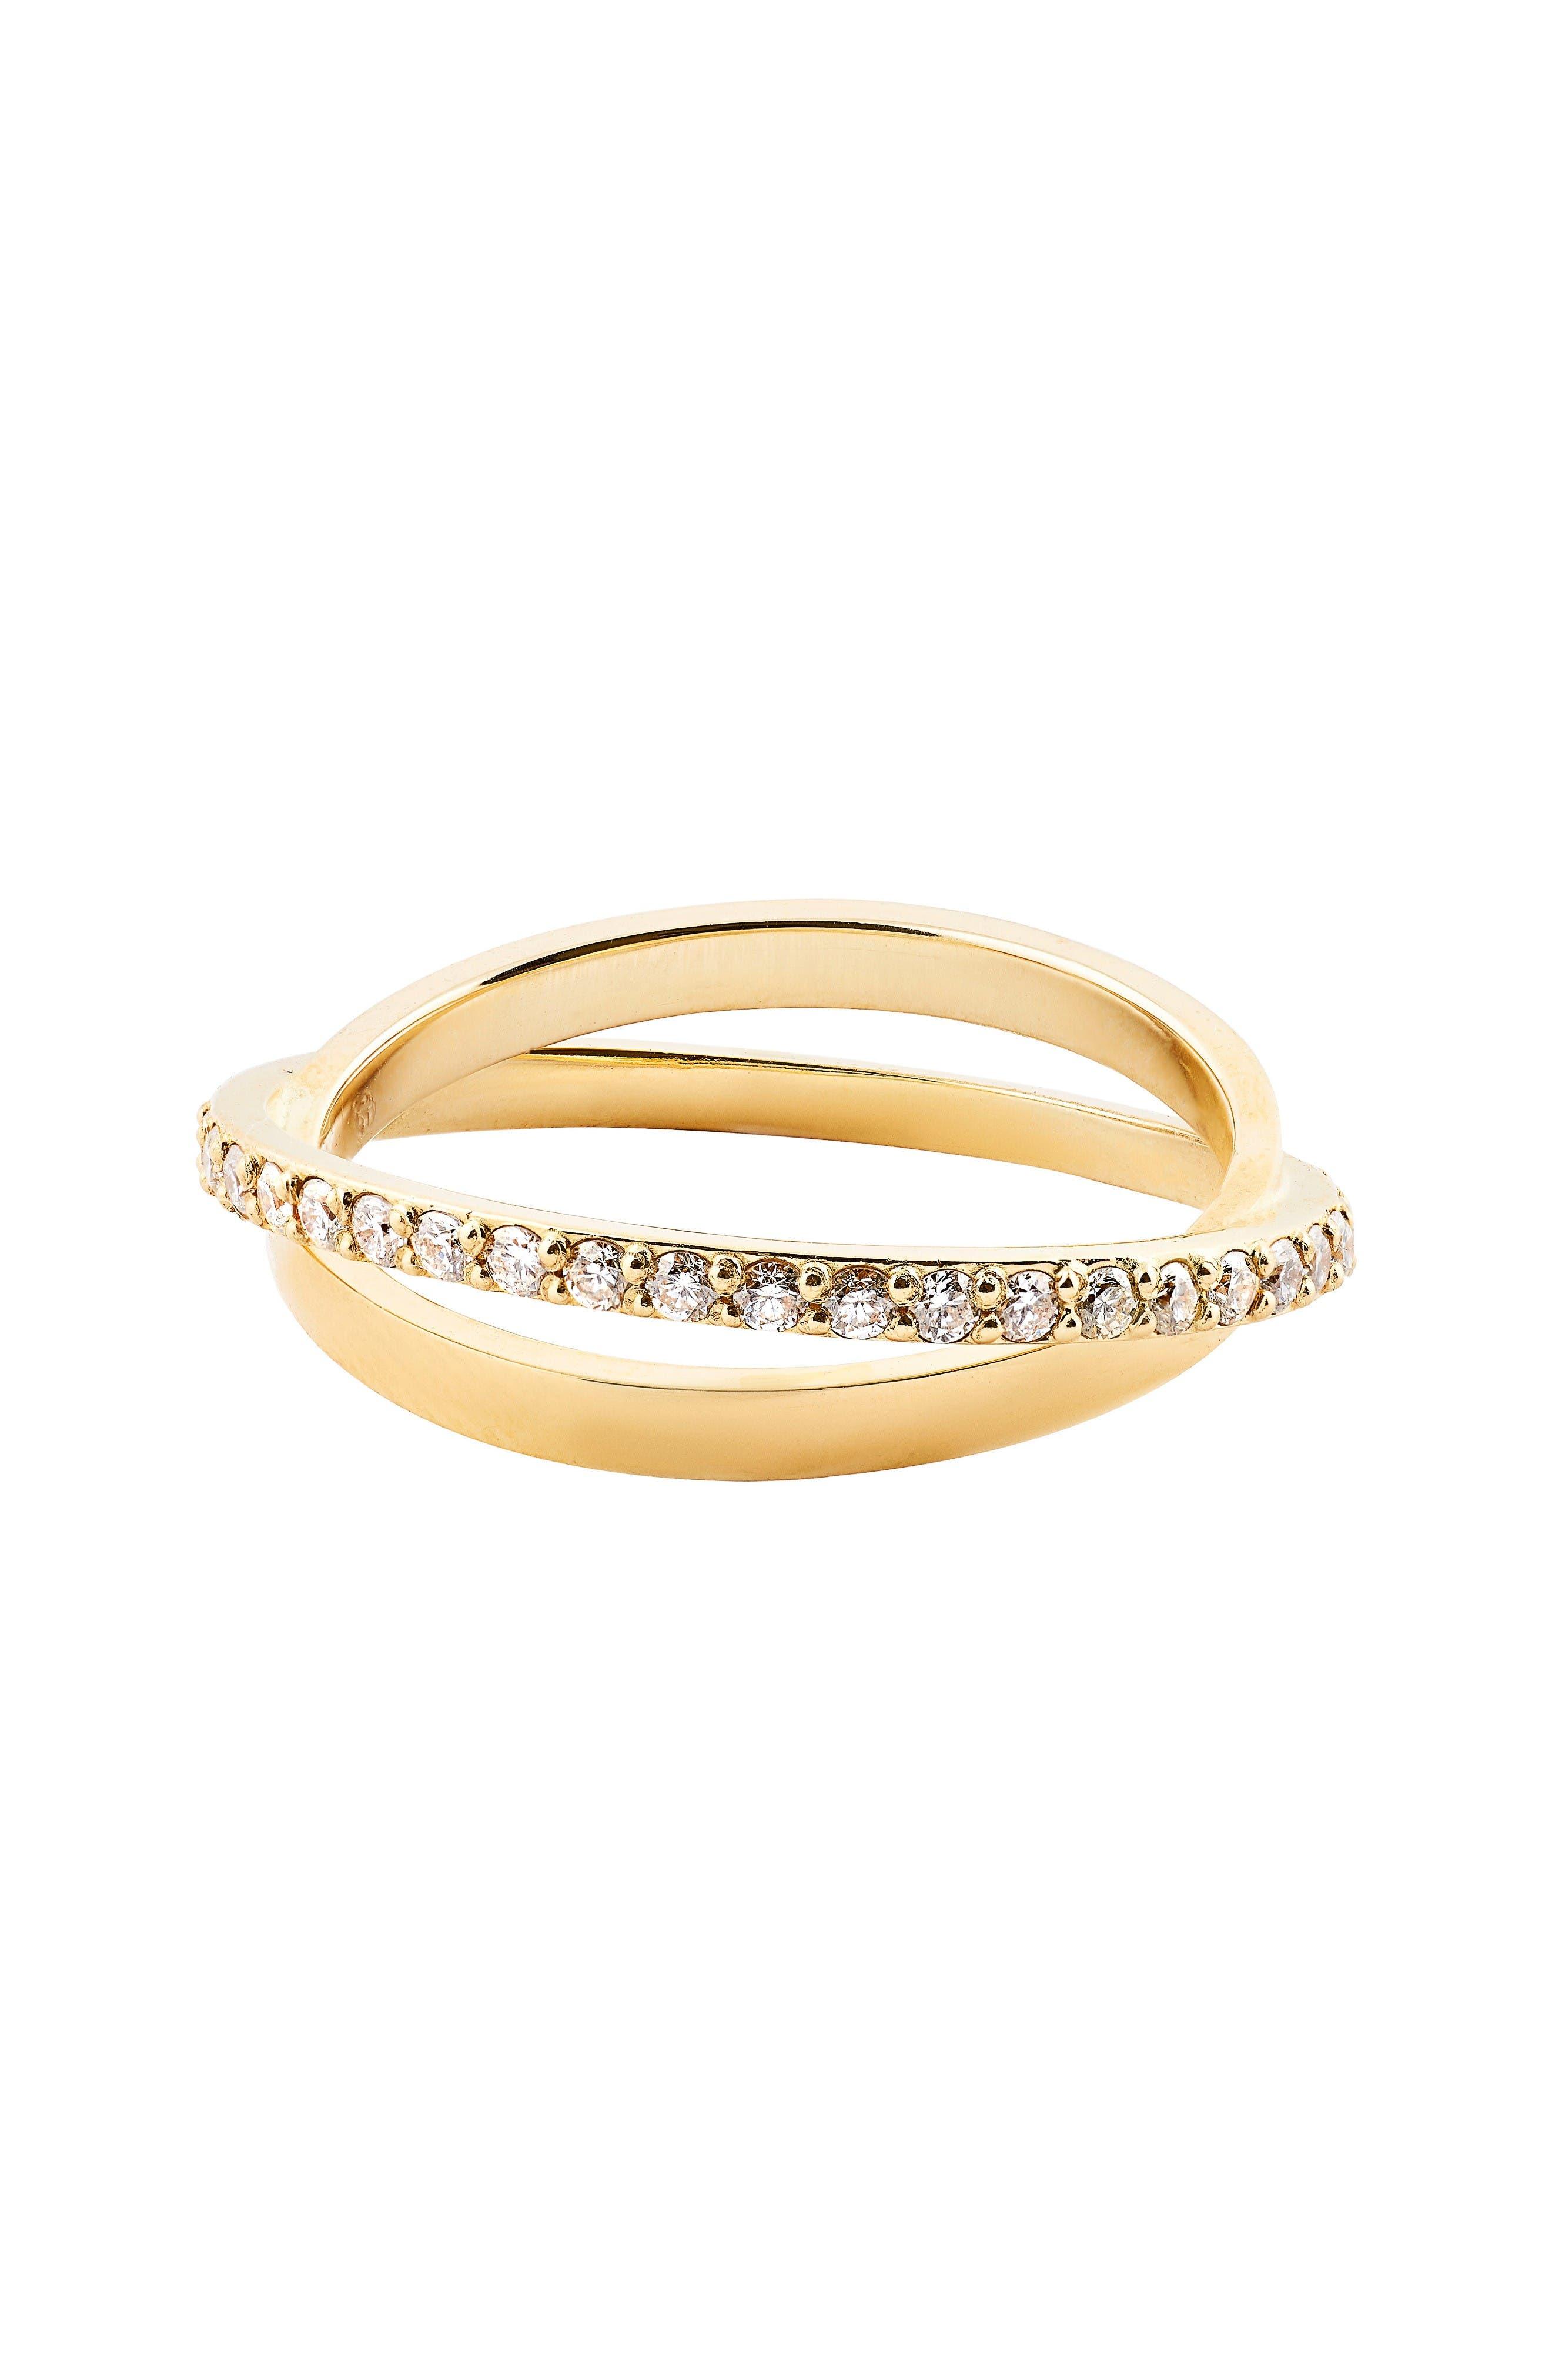 Lana Jewelry Flawless Diamond Twist Ring